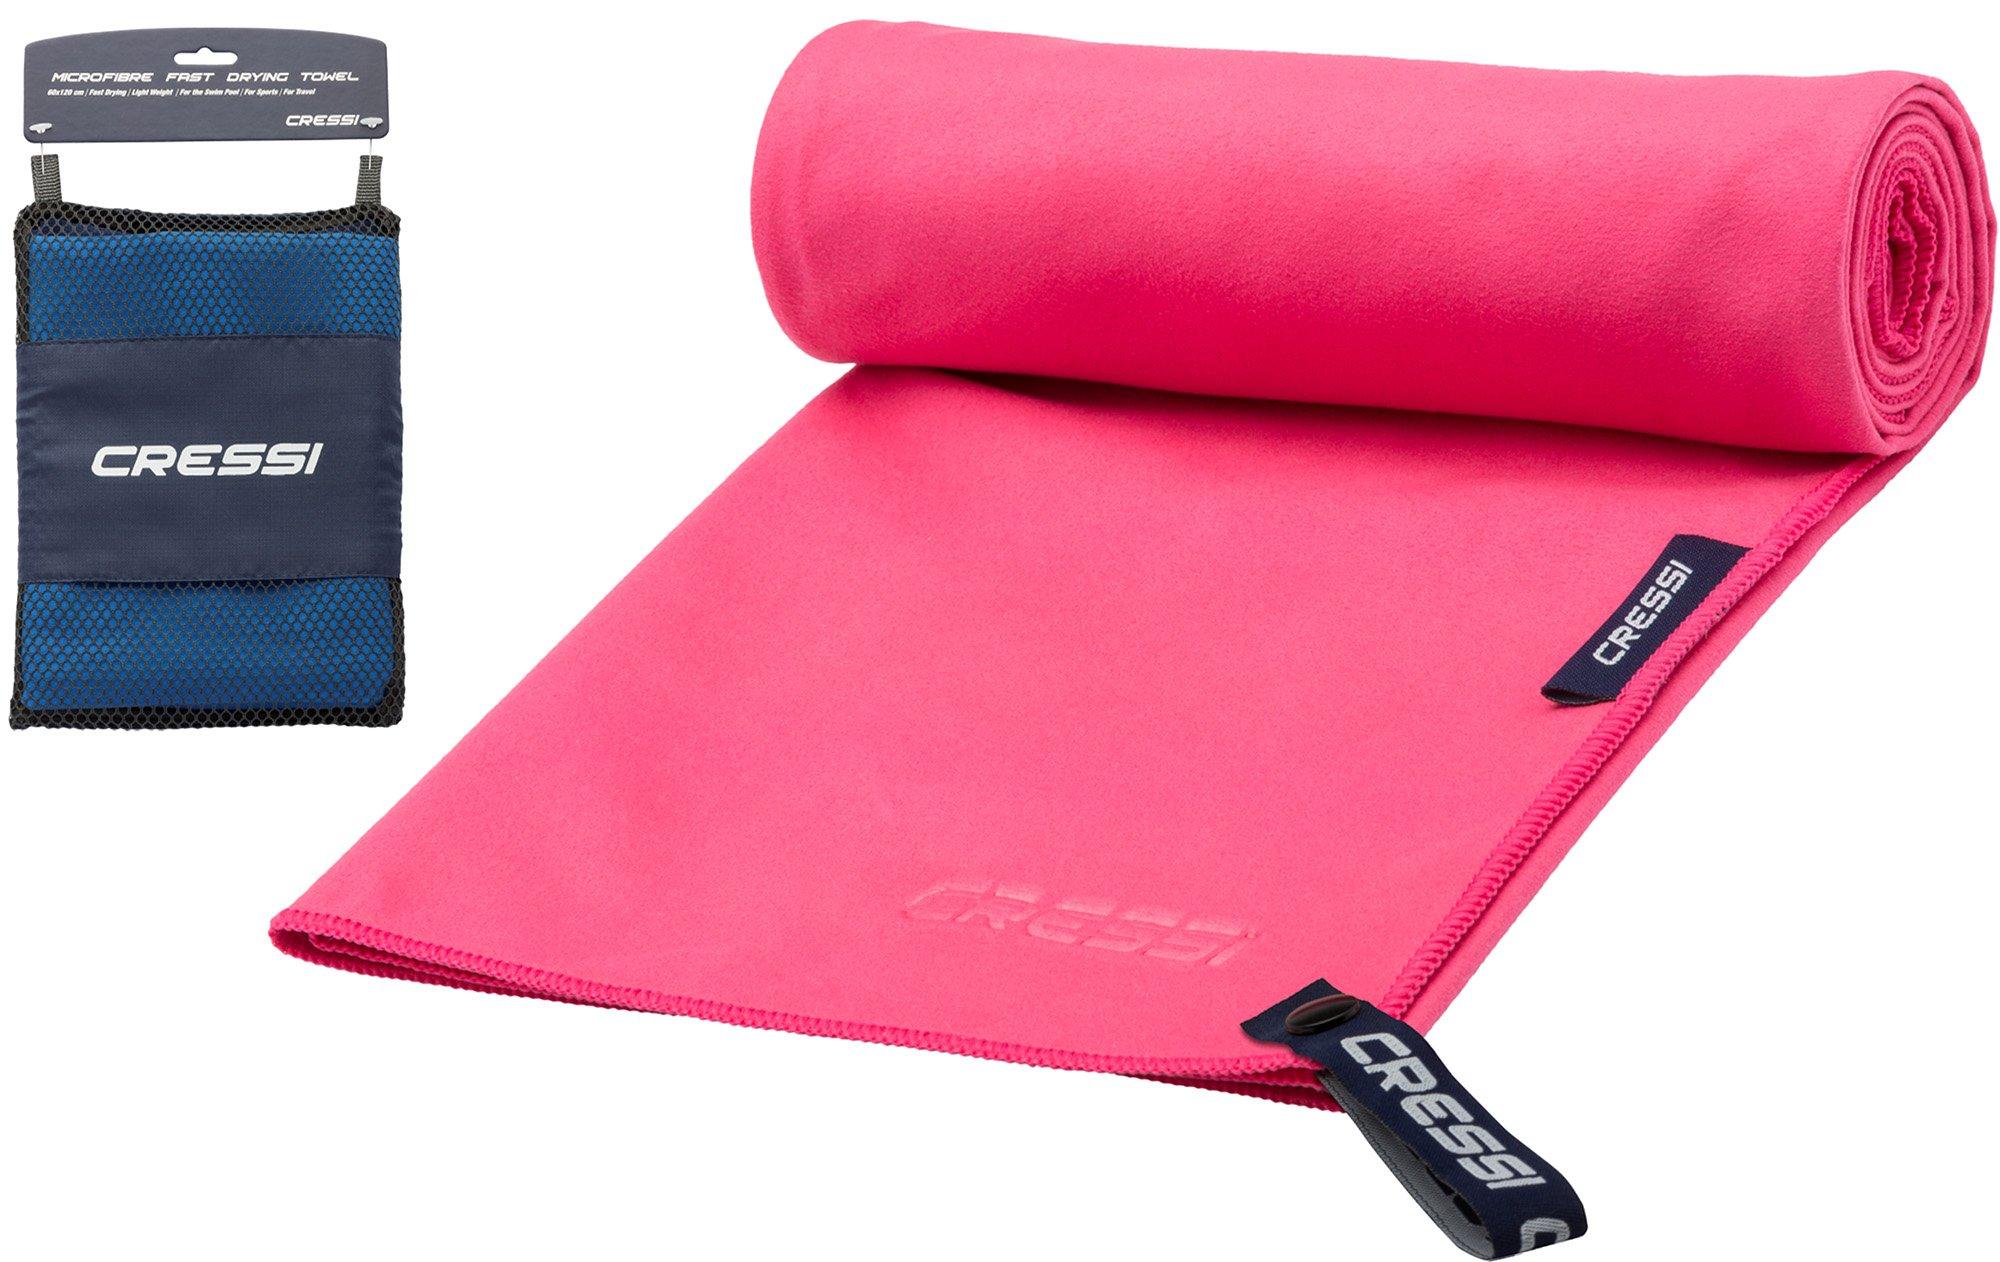 Cressi Microfibre Fast Drying Toalla de Sport, Unisex Adulto, Rojo, 30x50cm product image